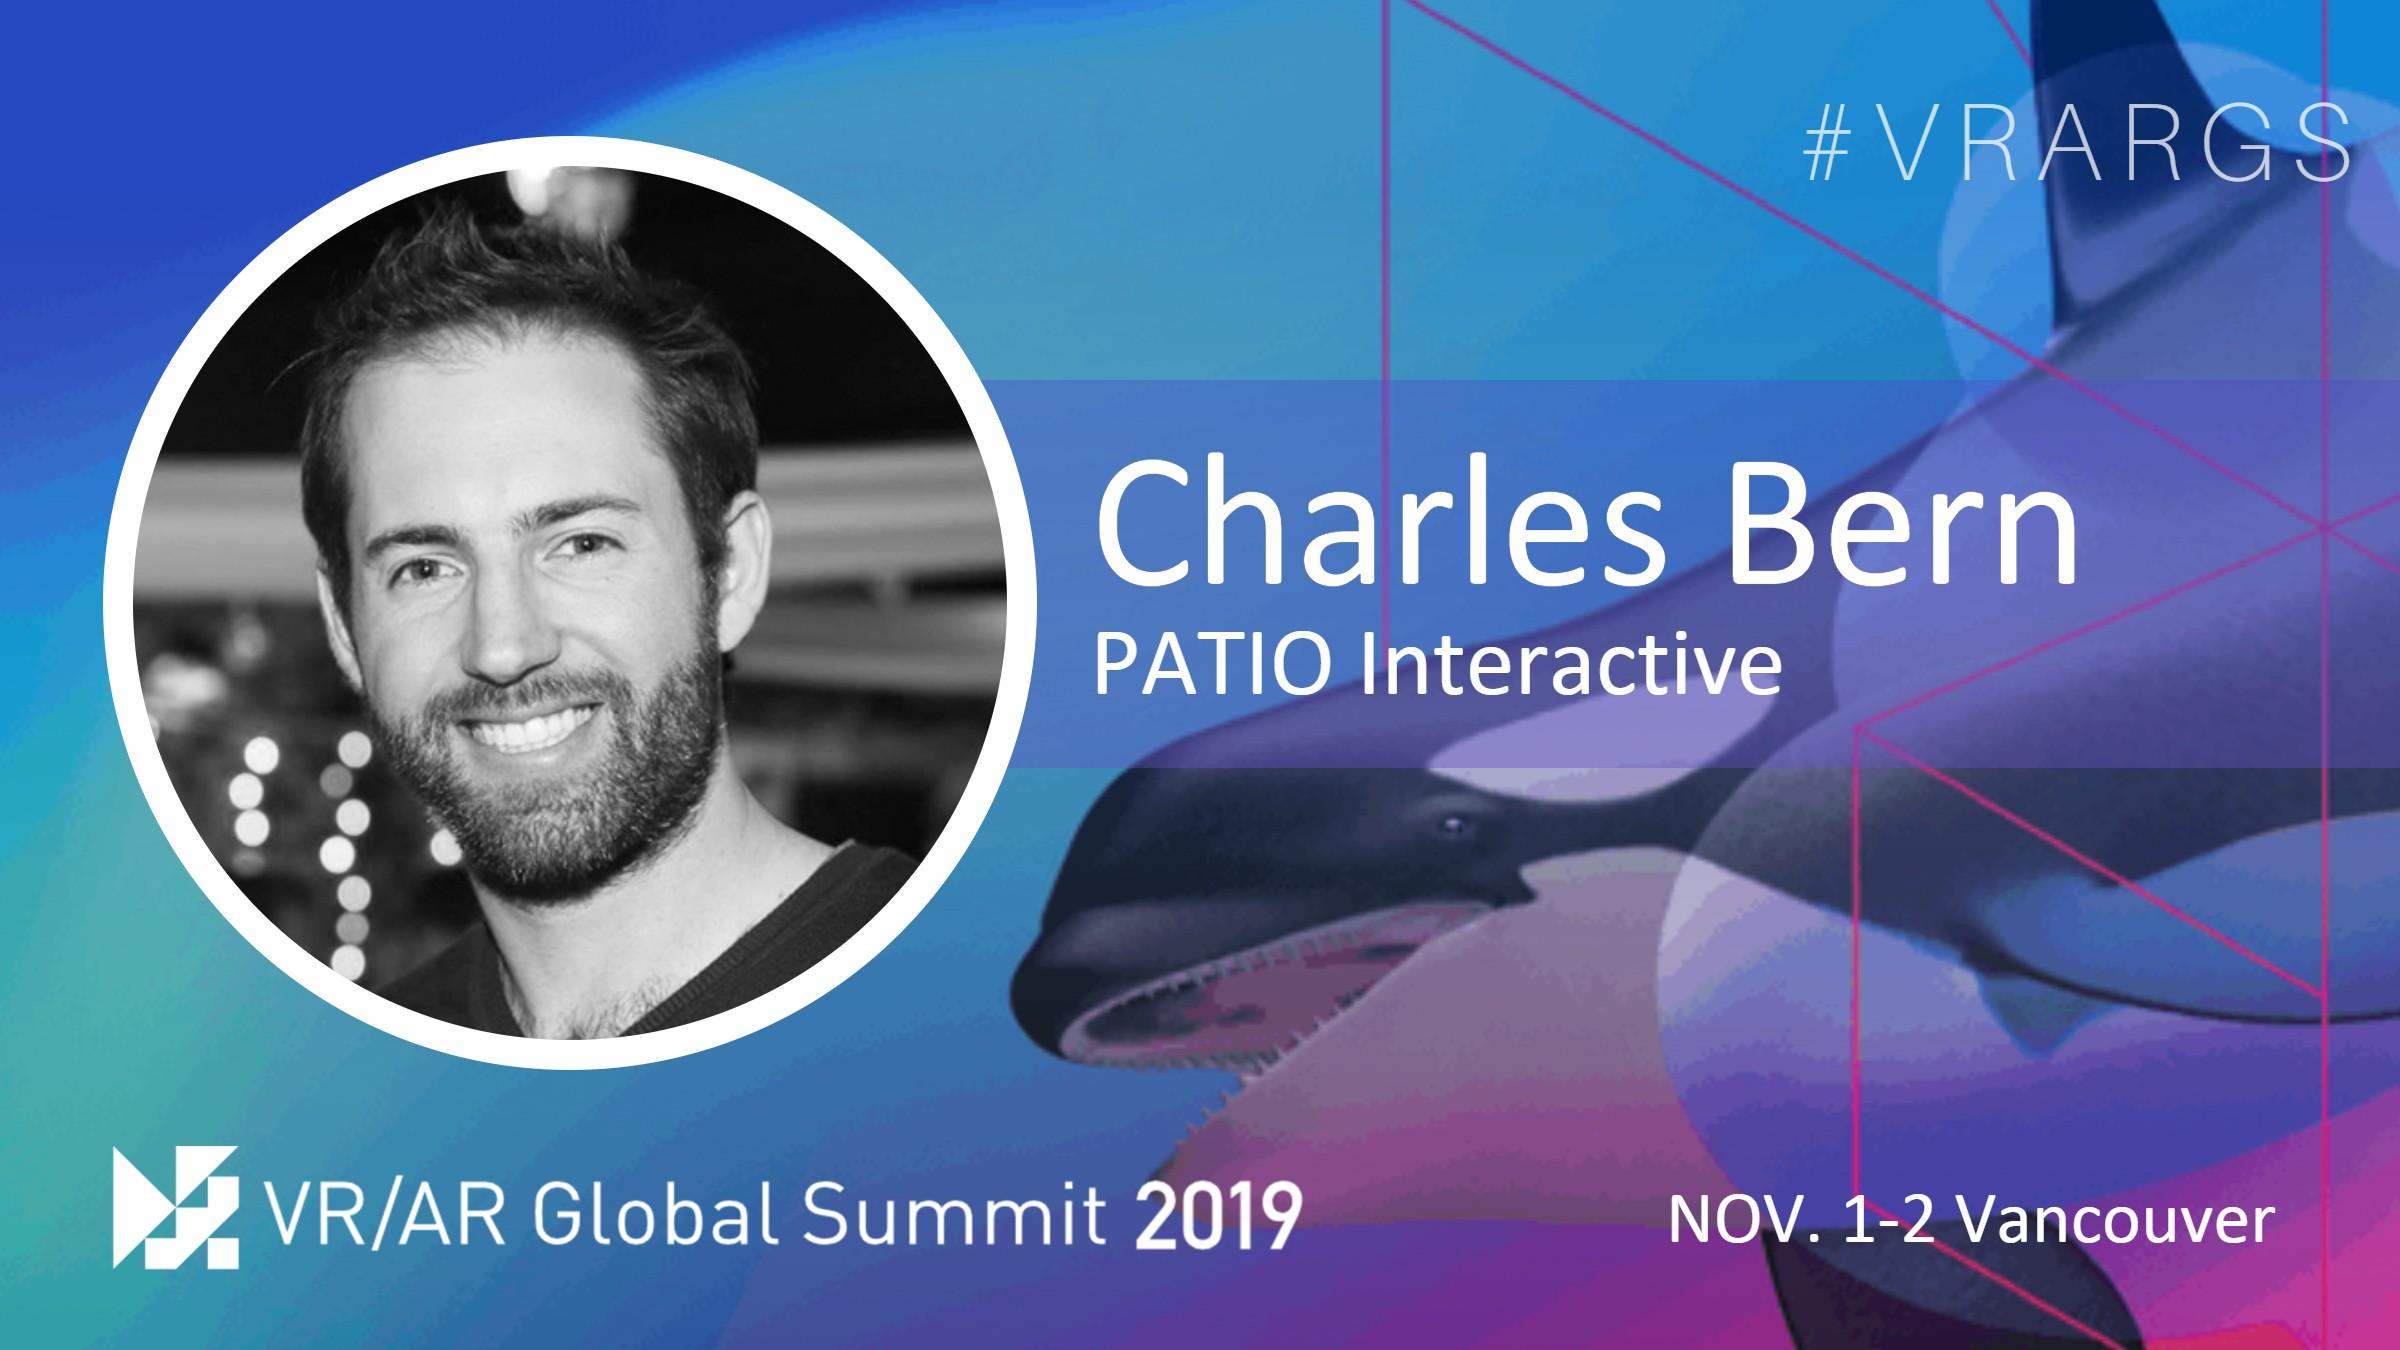 HighRes-Charles-Bern-Patio-Interactive-VRARGS-VRAR-Global-Summit-Spatial-Computing-Vancouver.jpg